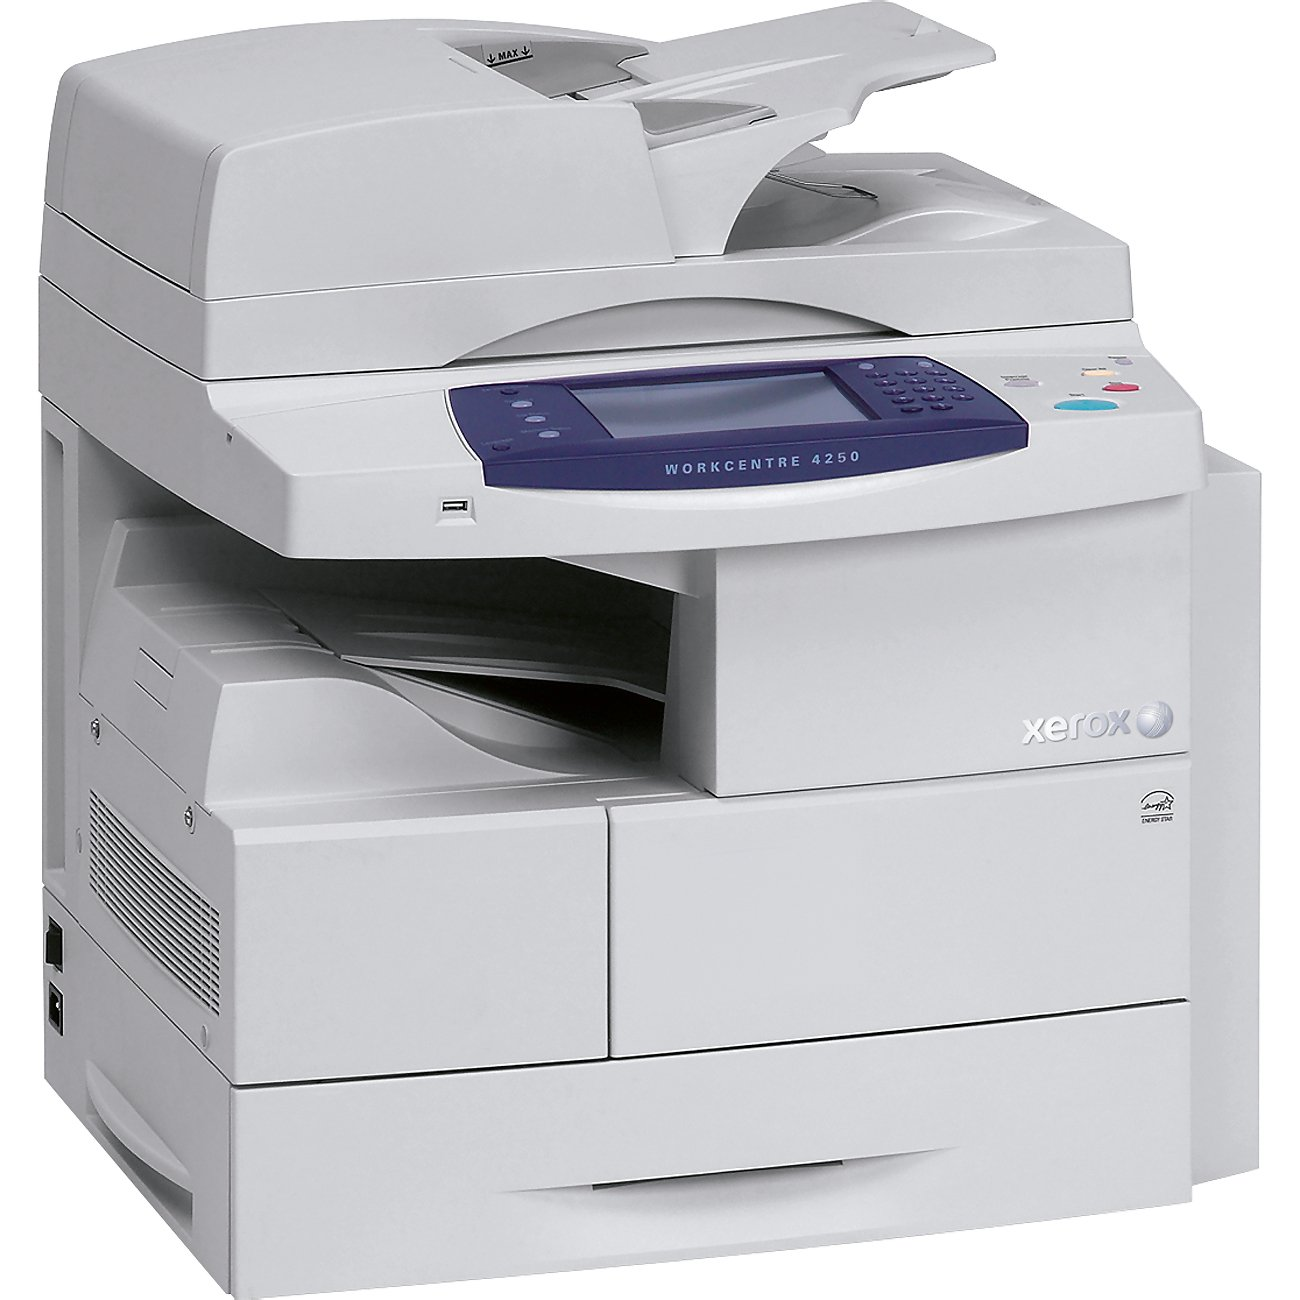 Amazon.com: Xerox Workcentre 4250/X Multifunction - Monochrome - Laser -  Copy, Print, Scan: Electronics